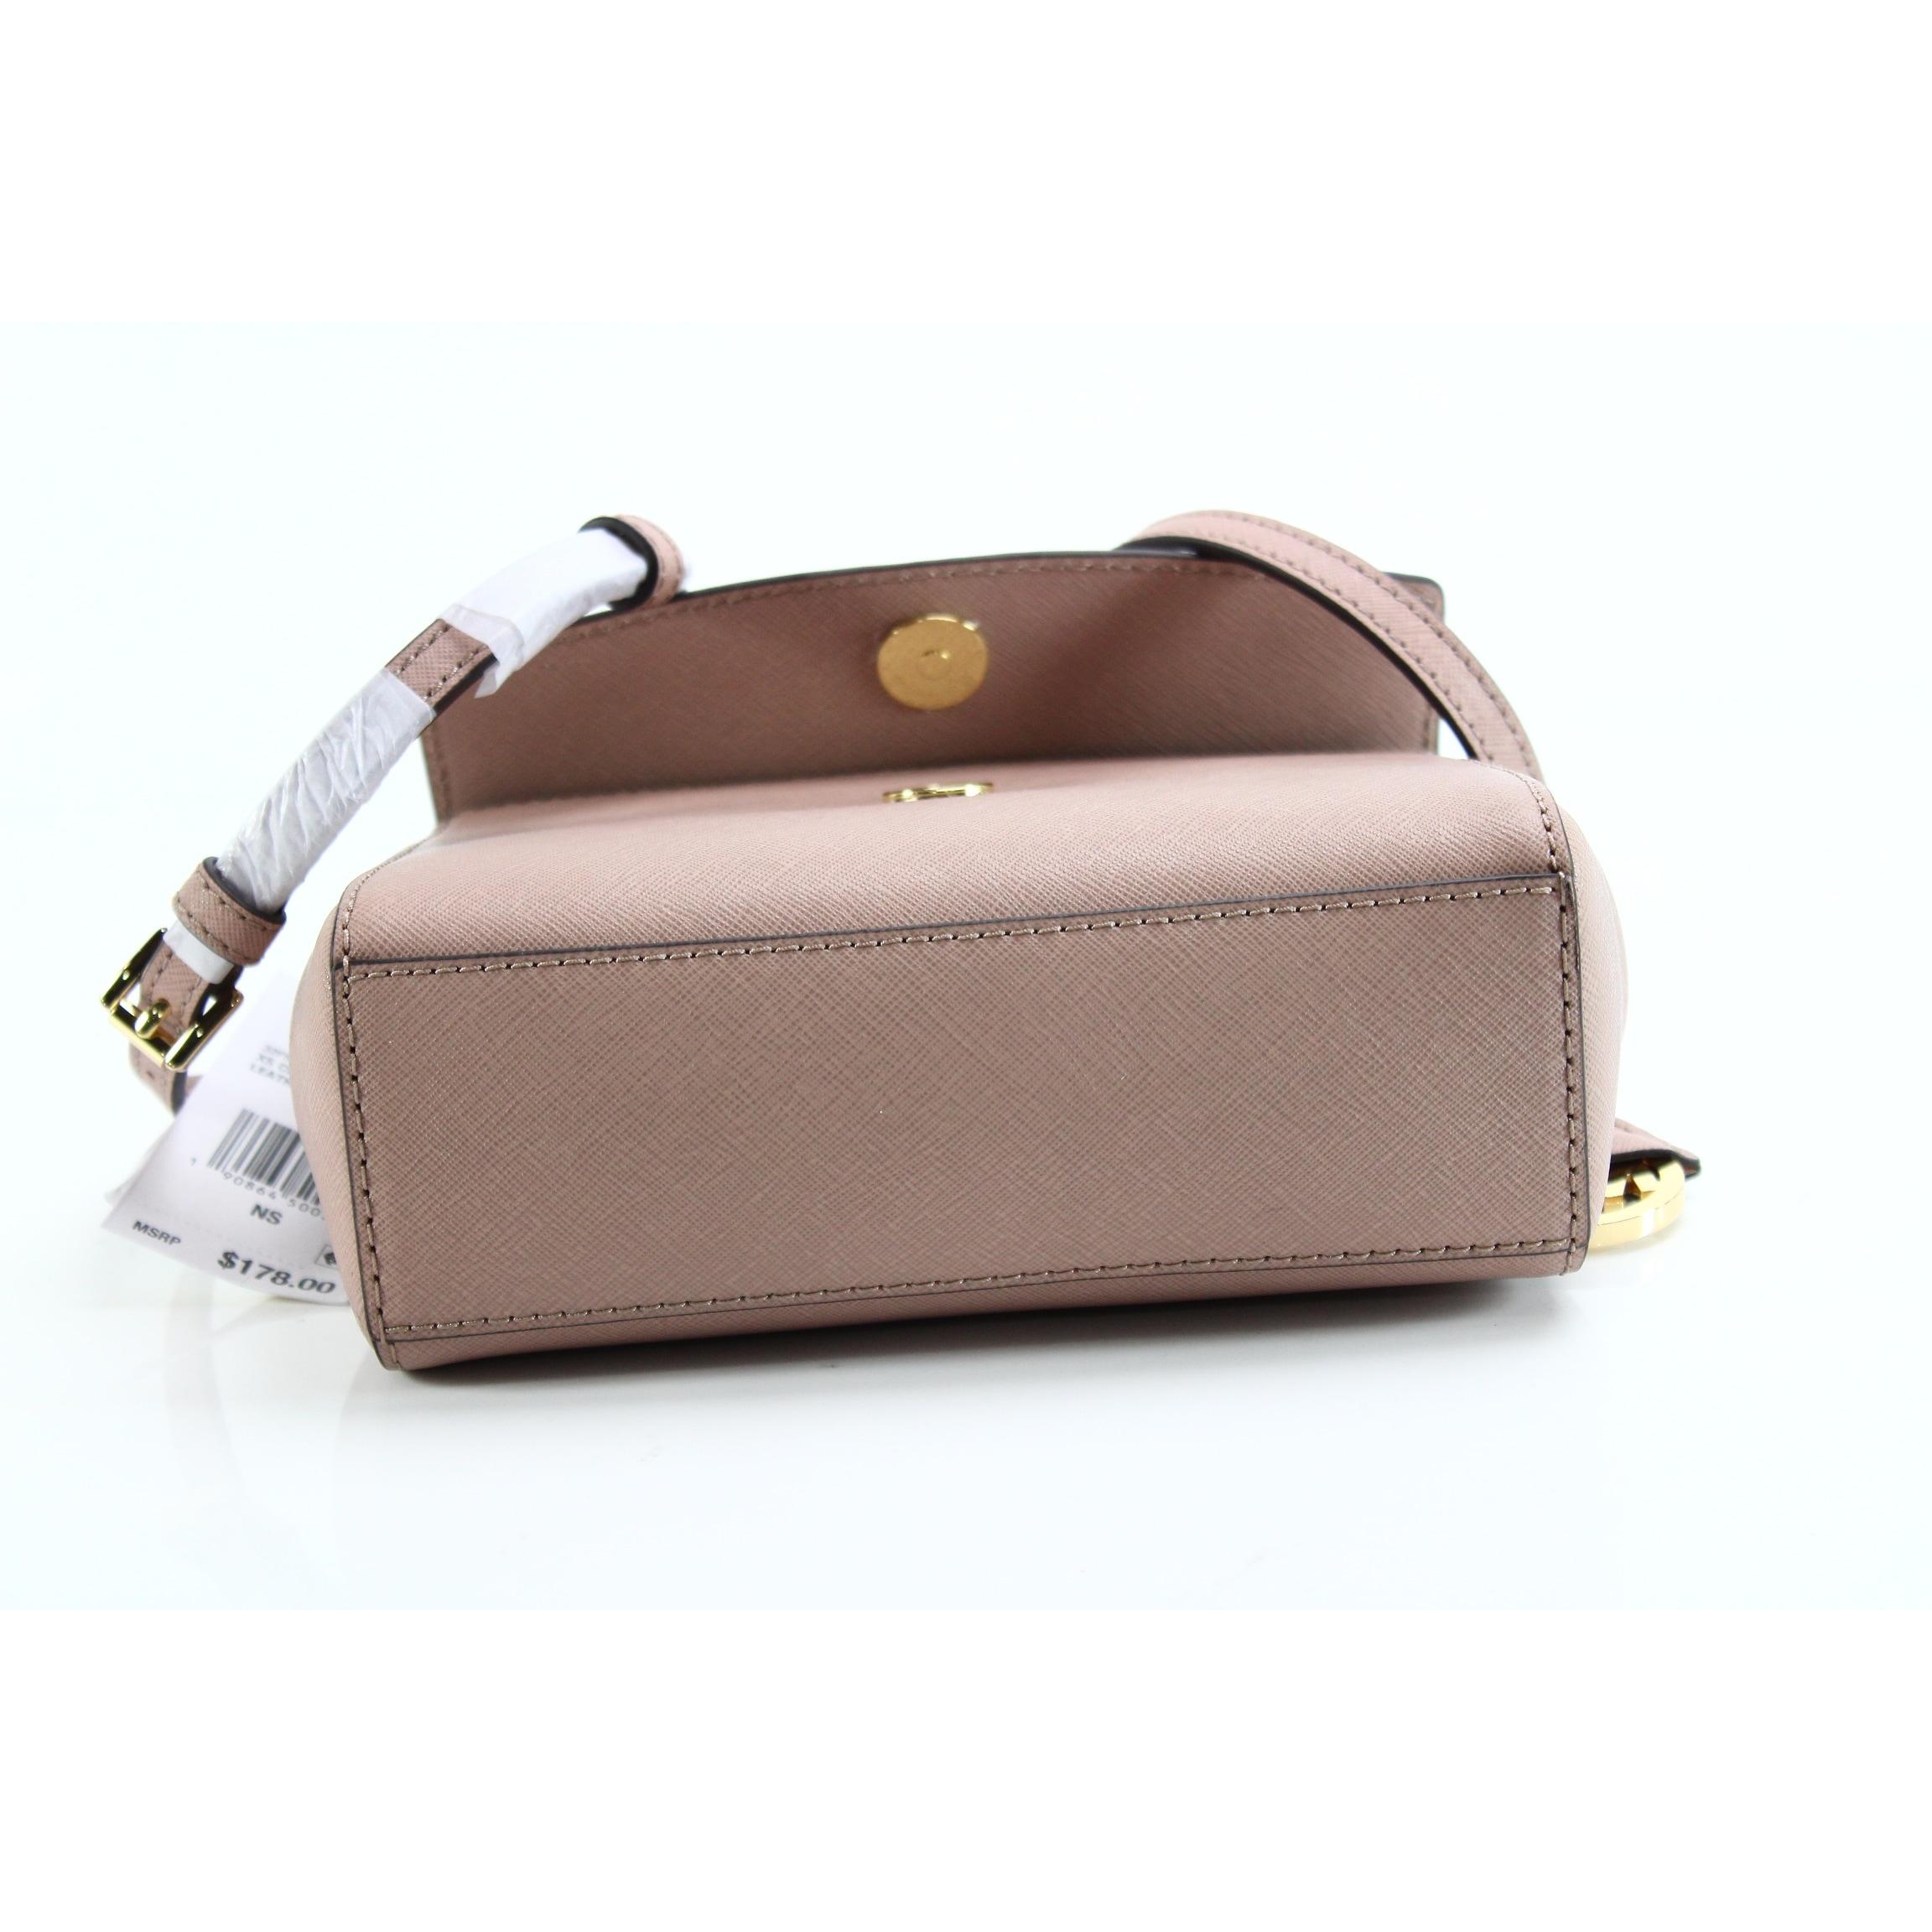 3fd15055a9c4 Shop Michael Kors NEW Pink Fawn Saffiano Ava Mini Crossbody Handbag Purse -  Free Shipping Today - Overstock - 20634935